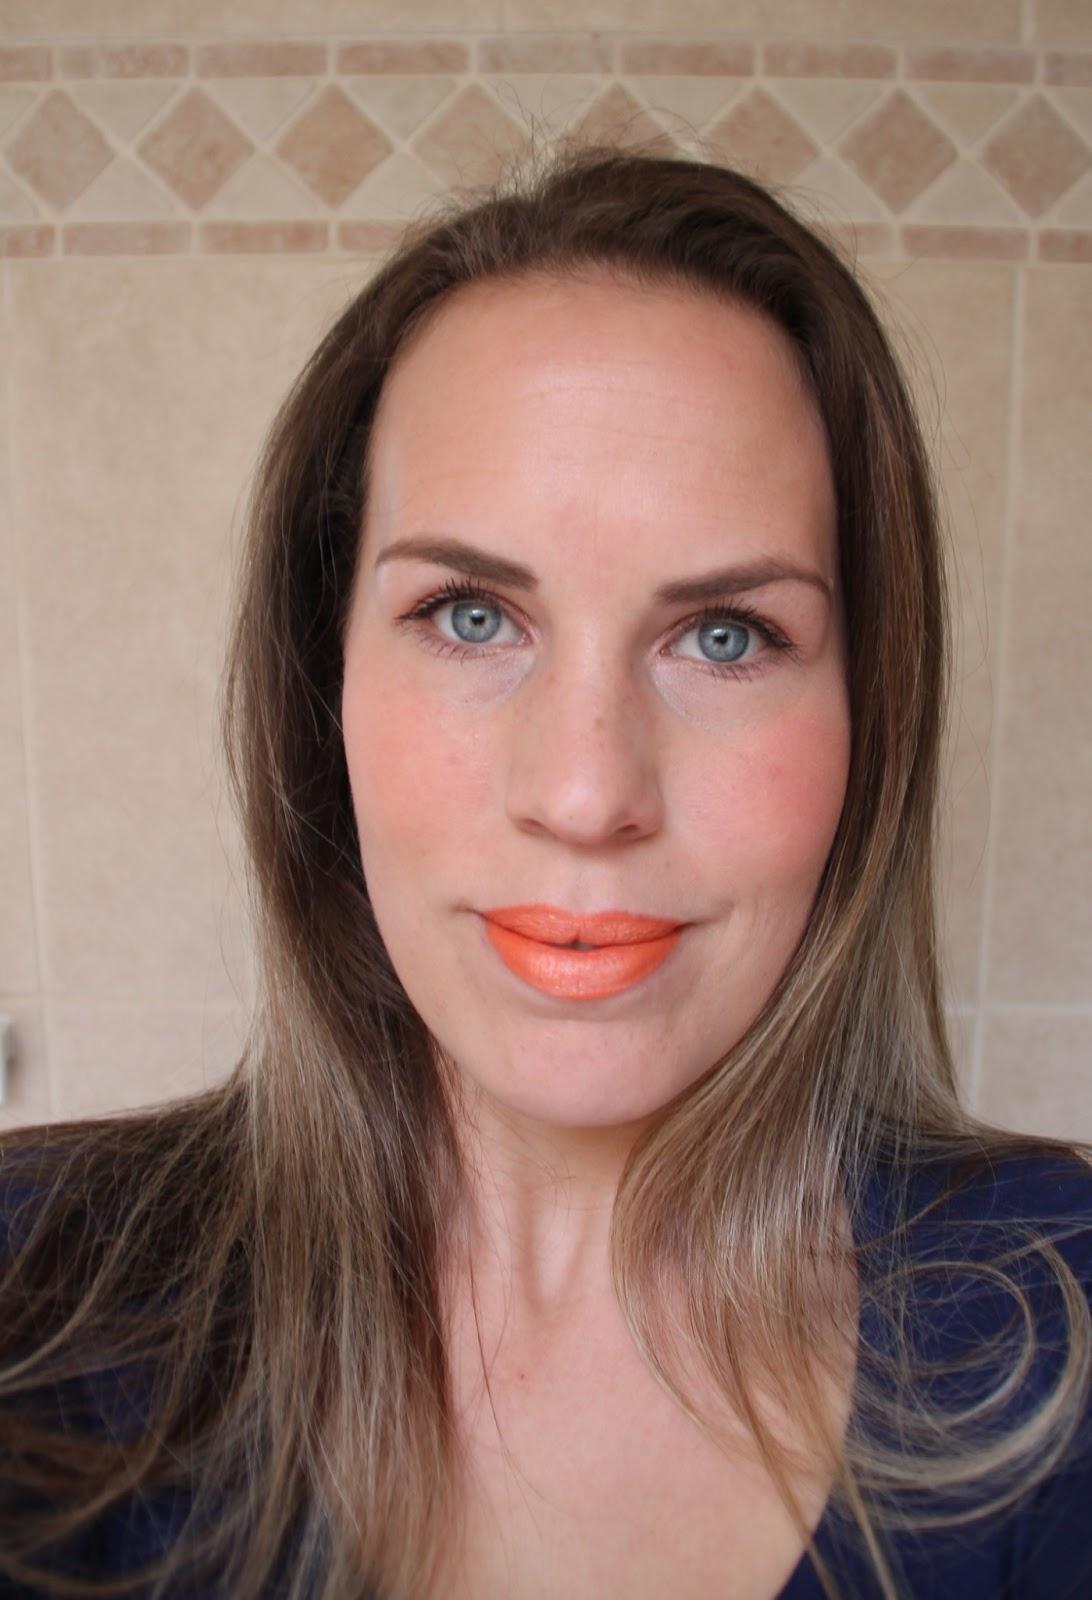 Crystaliciousss Mac Hailey Williams Lipstick Sounds Like